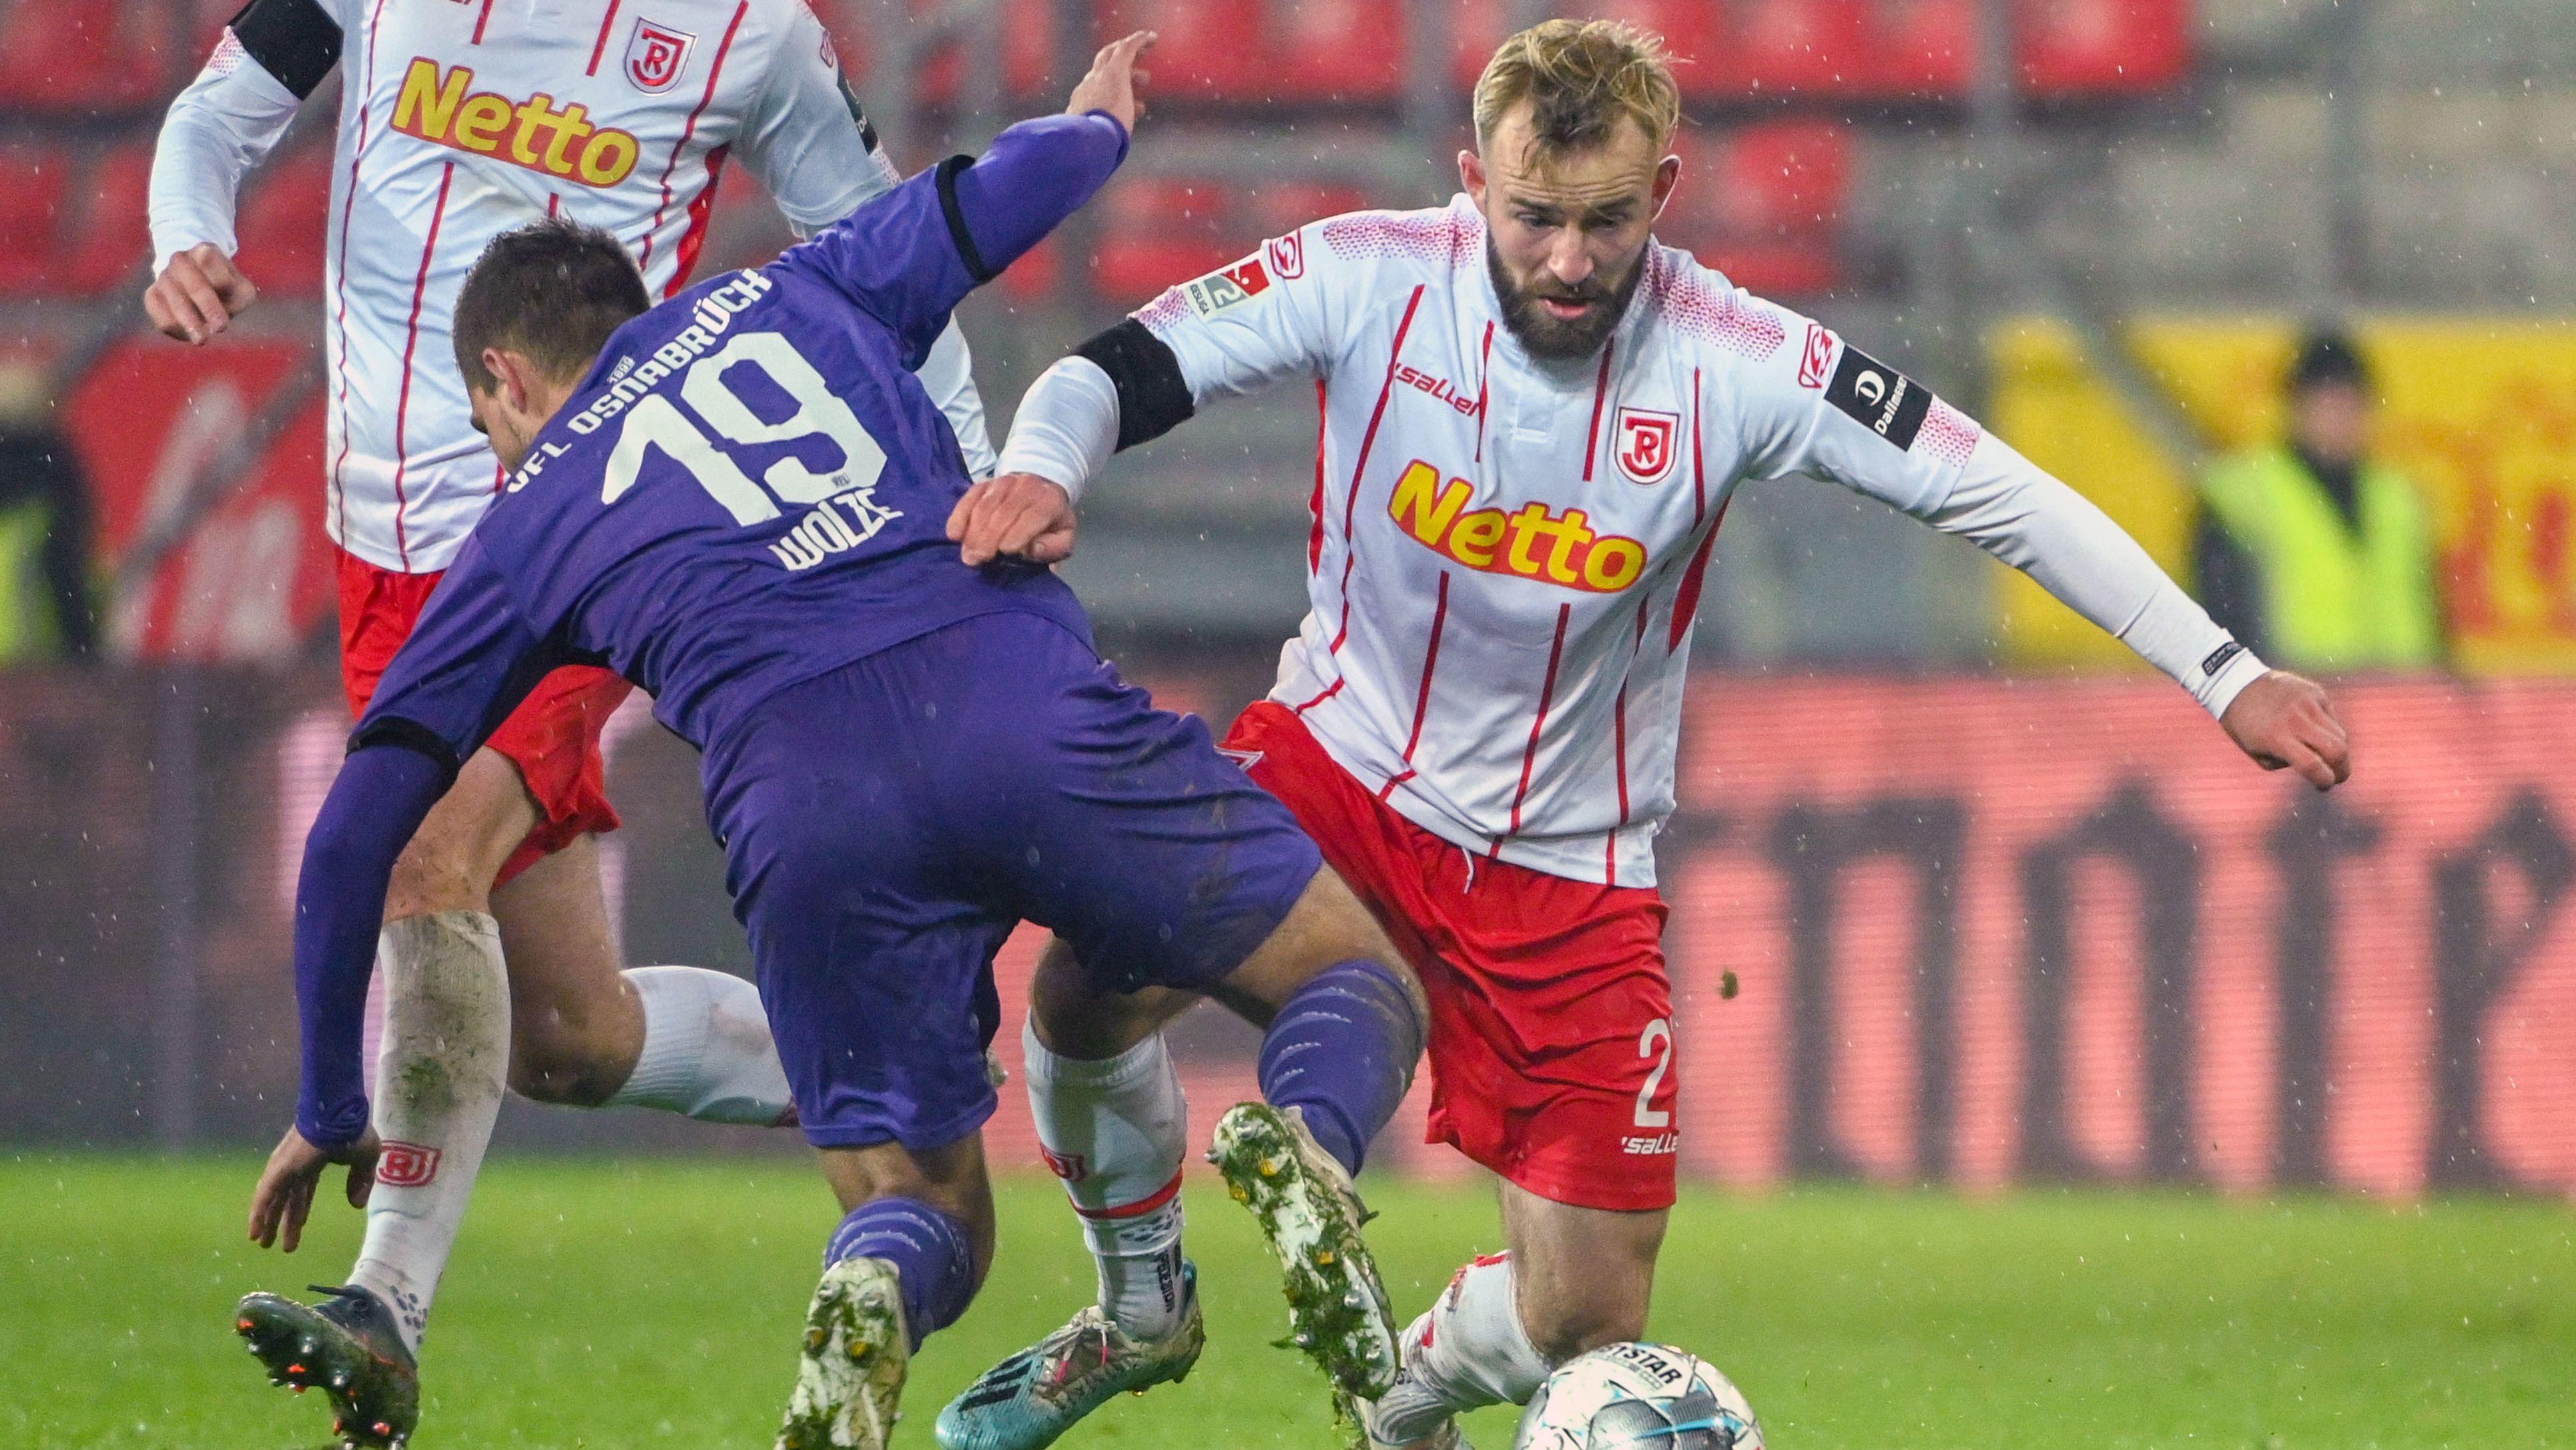 Spielszene Jahn Regensburg - VfL Osnabrück